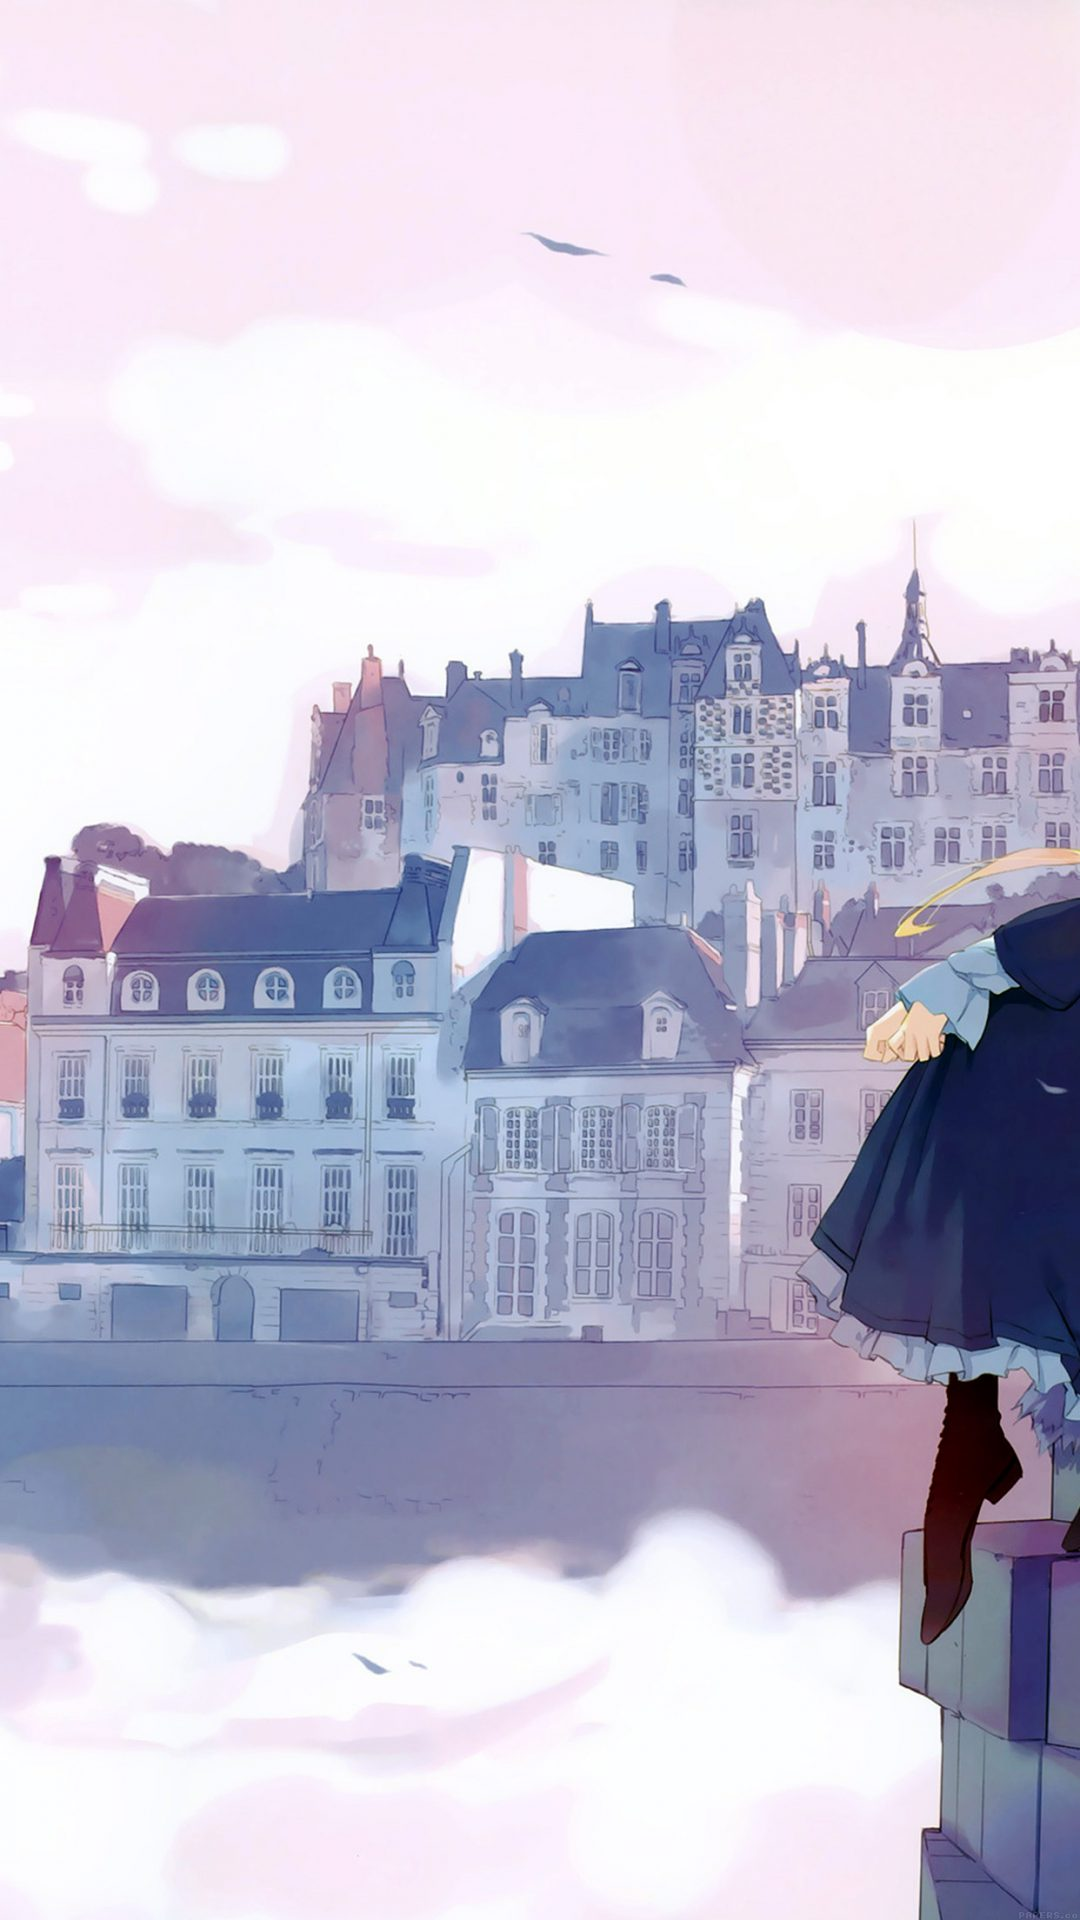 Anime Thinking Girl Lake Illust Art